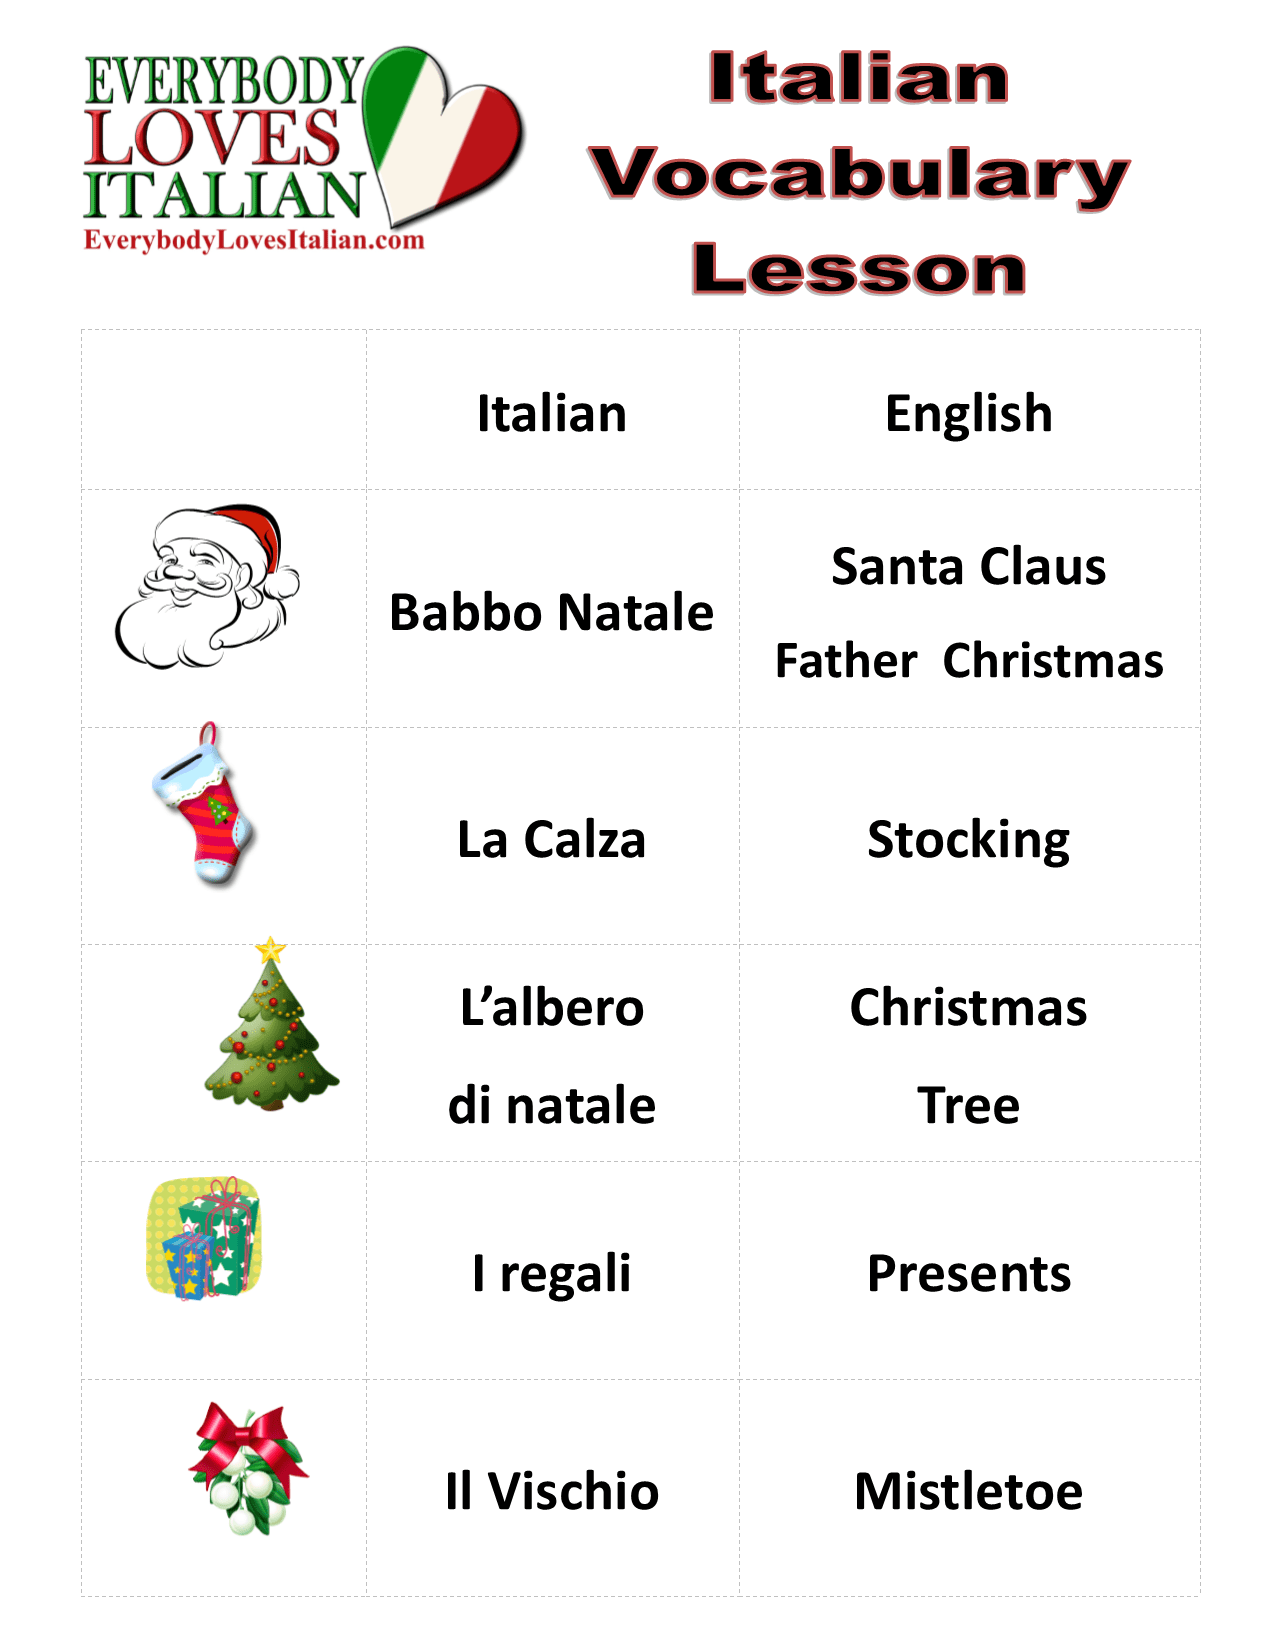 Italian Vocabulary Lesson 12 25